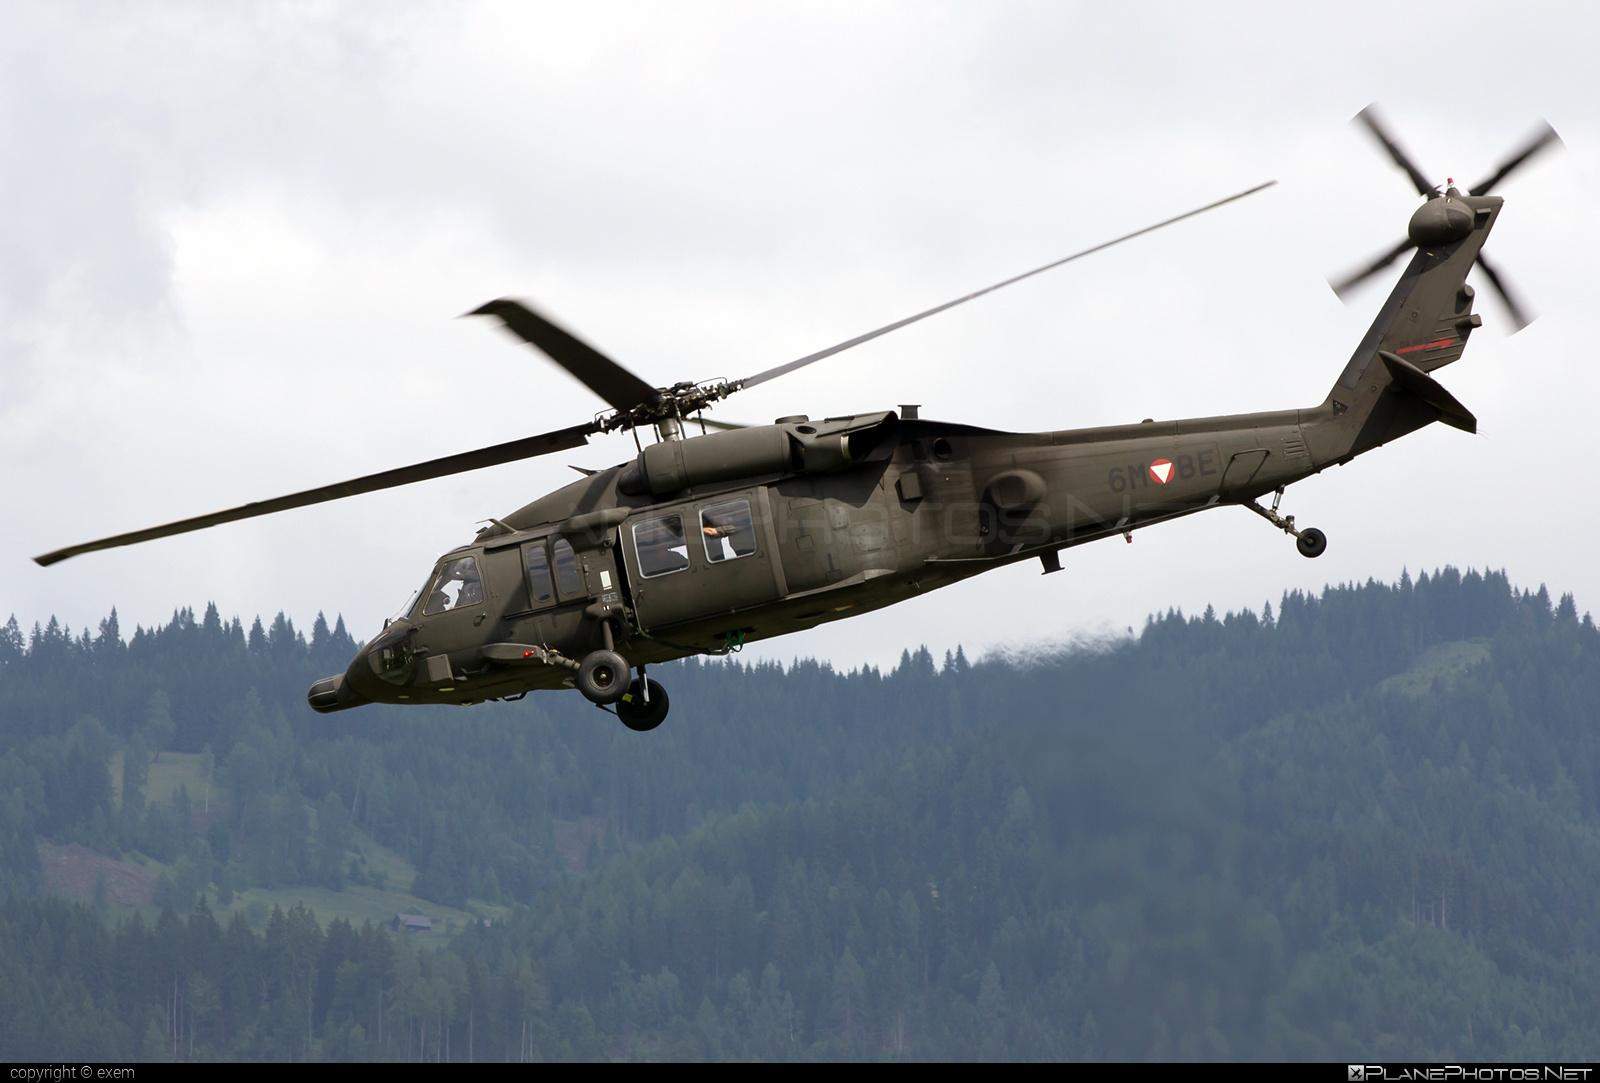 Sikorsky S-70A-42 Black Hawk - 6M-BE operated by Österreichische Luftstreitkräfte (Austrian Air Force) #airpower #airpower2013 #austrianairforce #blackhawk #s70 #s70a42 #s70a42blackhawk #sikorsky #sikorskys70